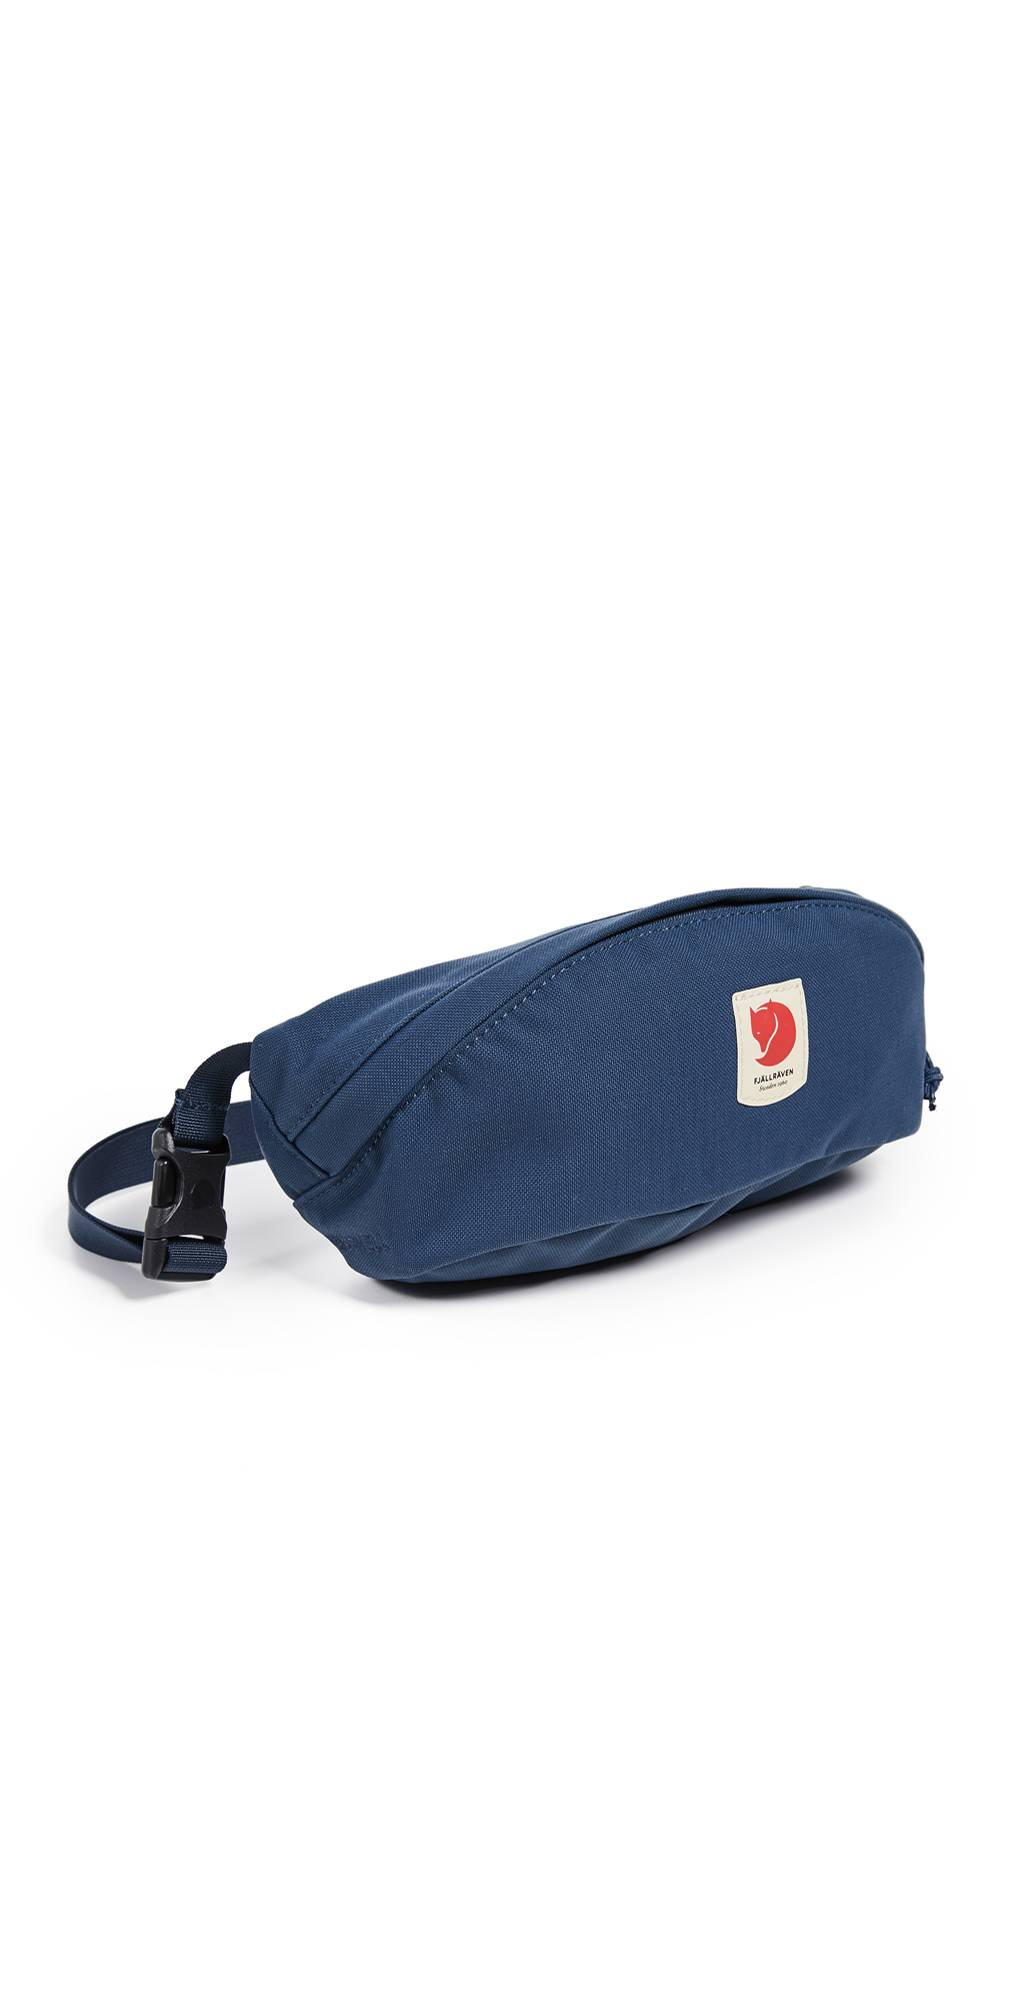 Fjallraven Hip Pack Medium  - Size: One Size